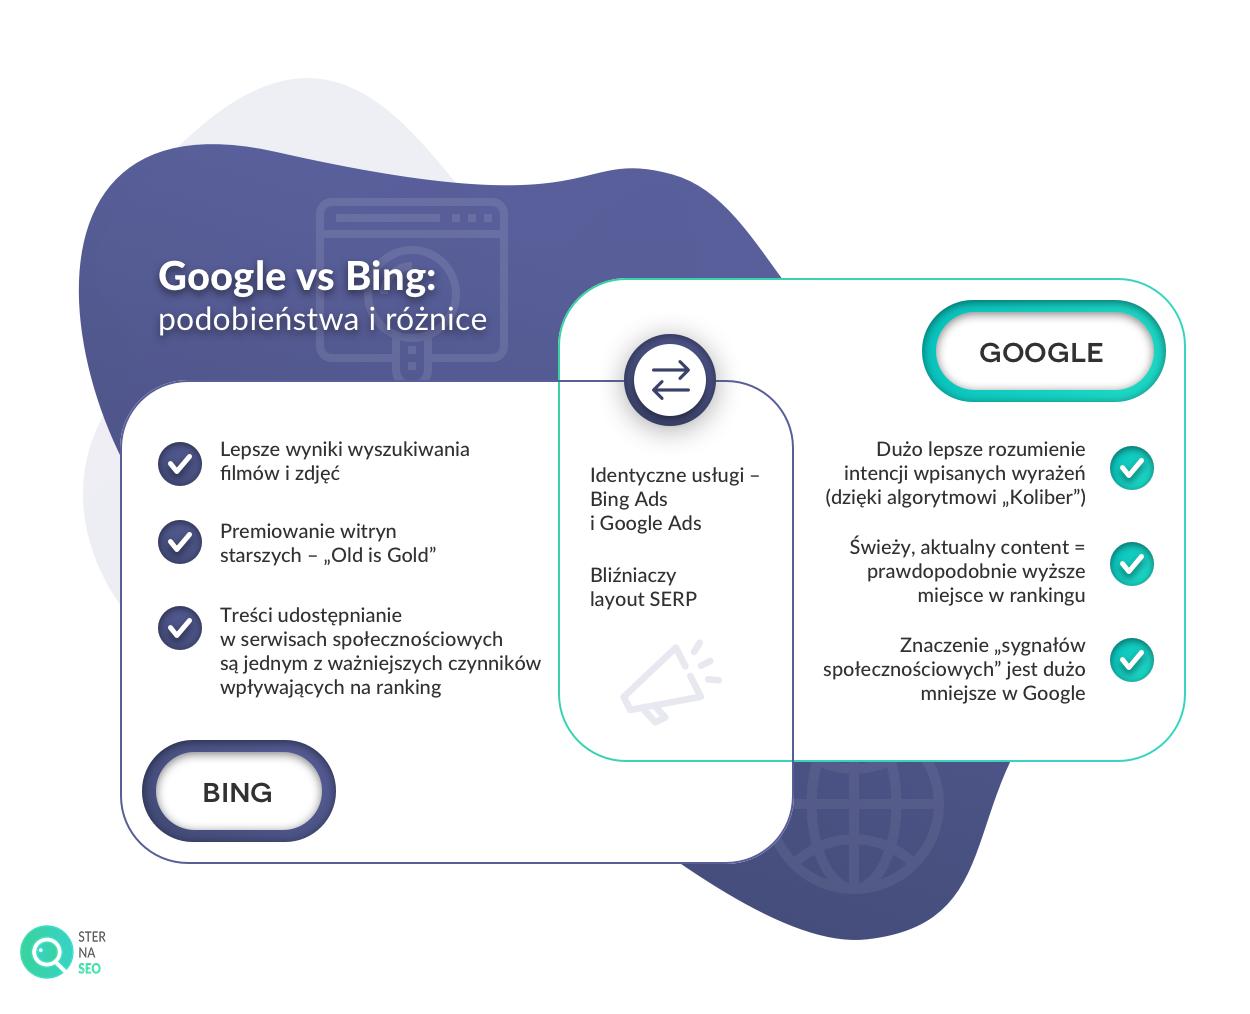 Google vs Bing podobieństwa i różnice